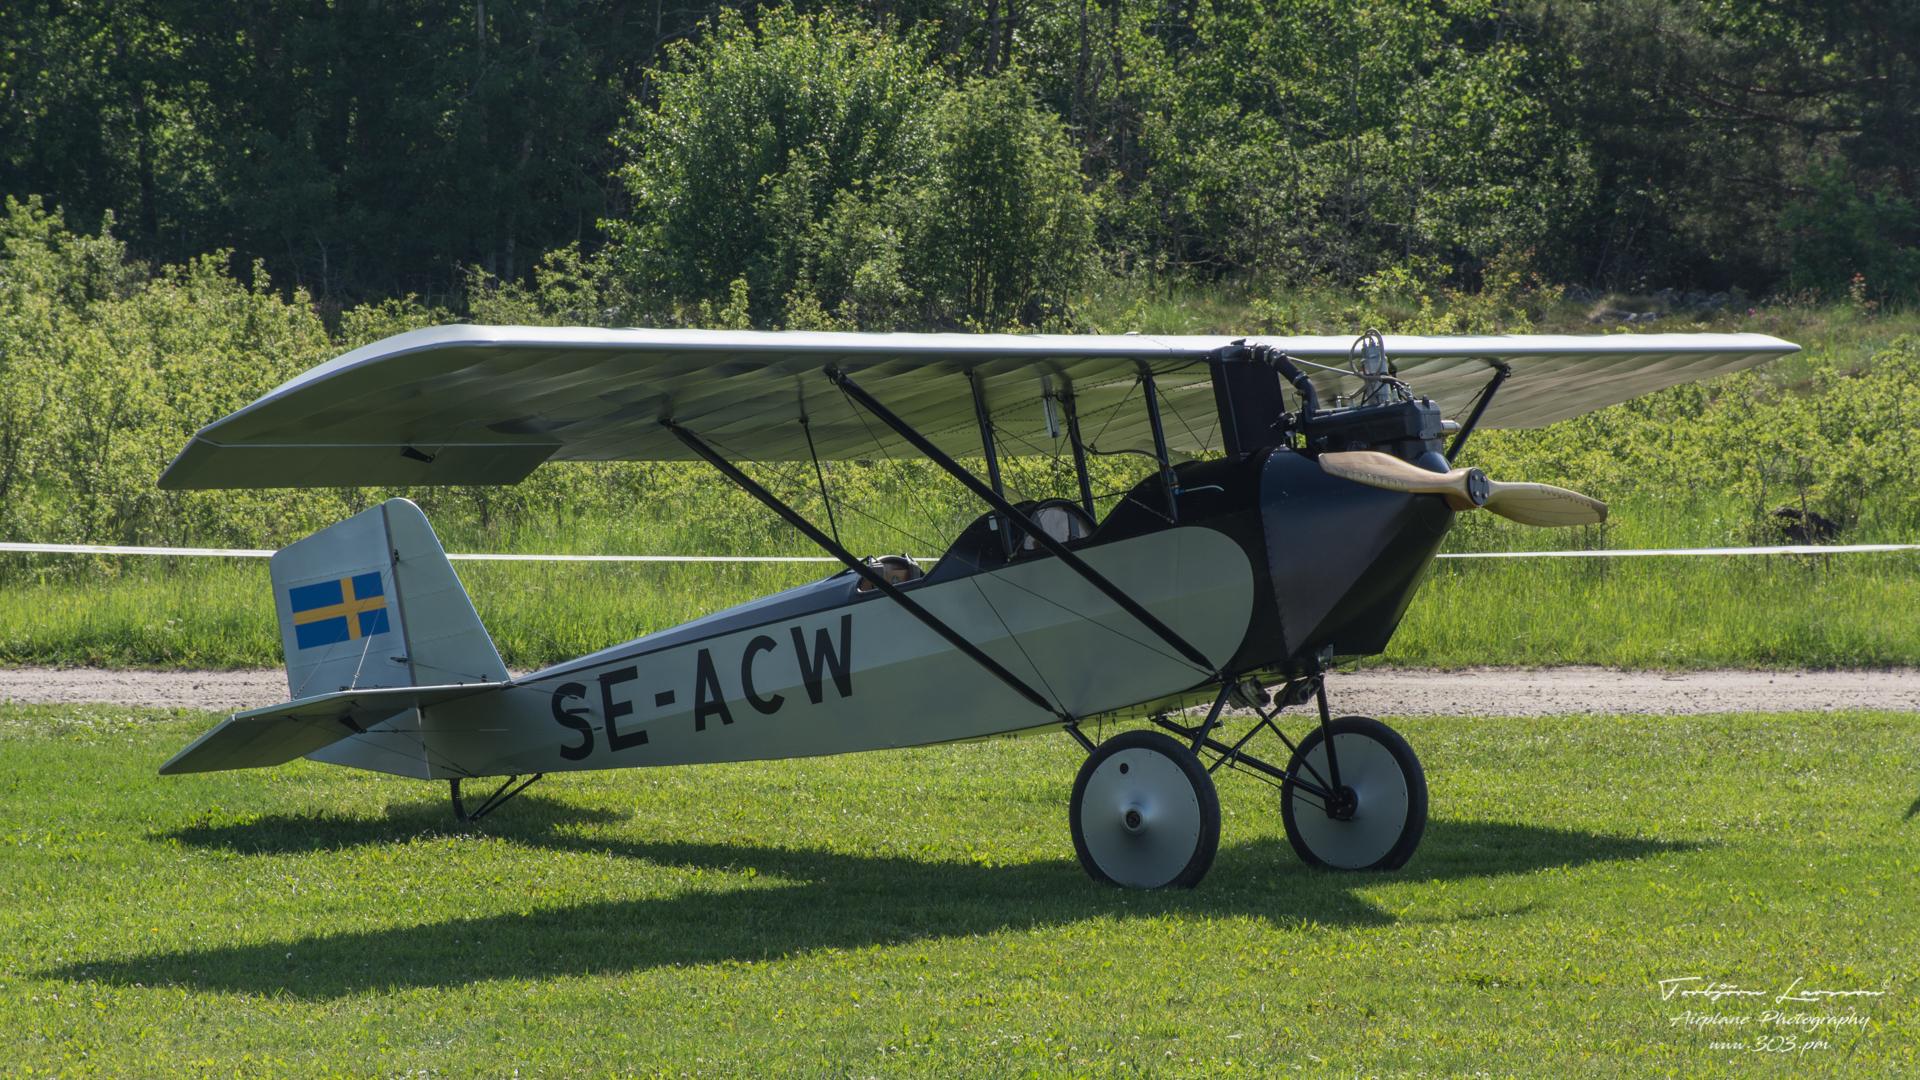 ACE_9329-Pietenpol Air Camper (SE-ACW)